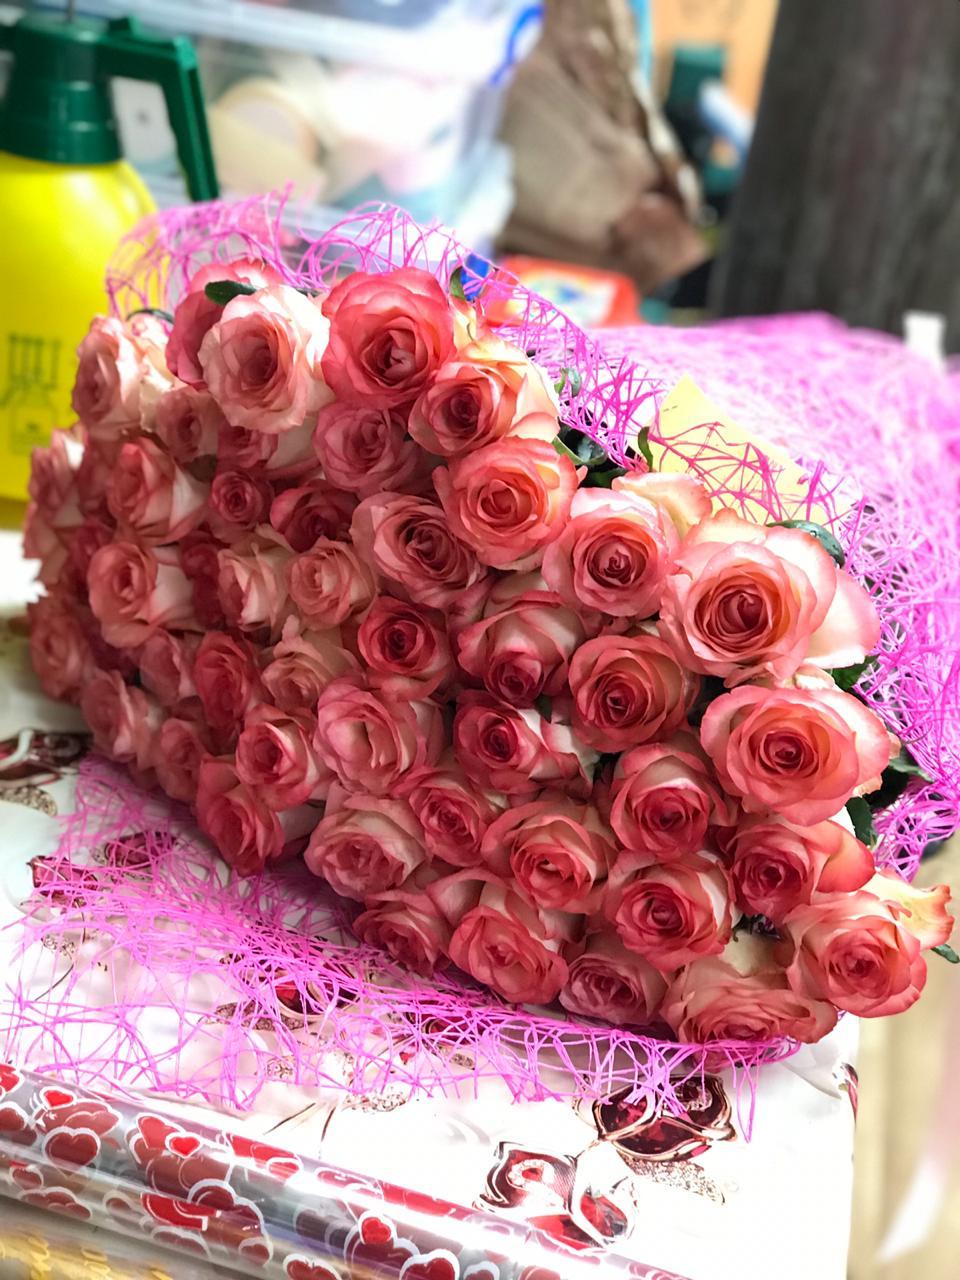 Заказ цветов на дом владикавказ #6